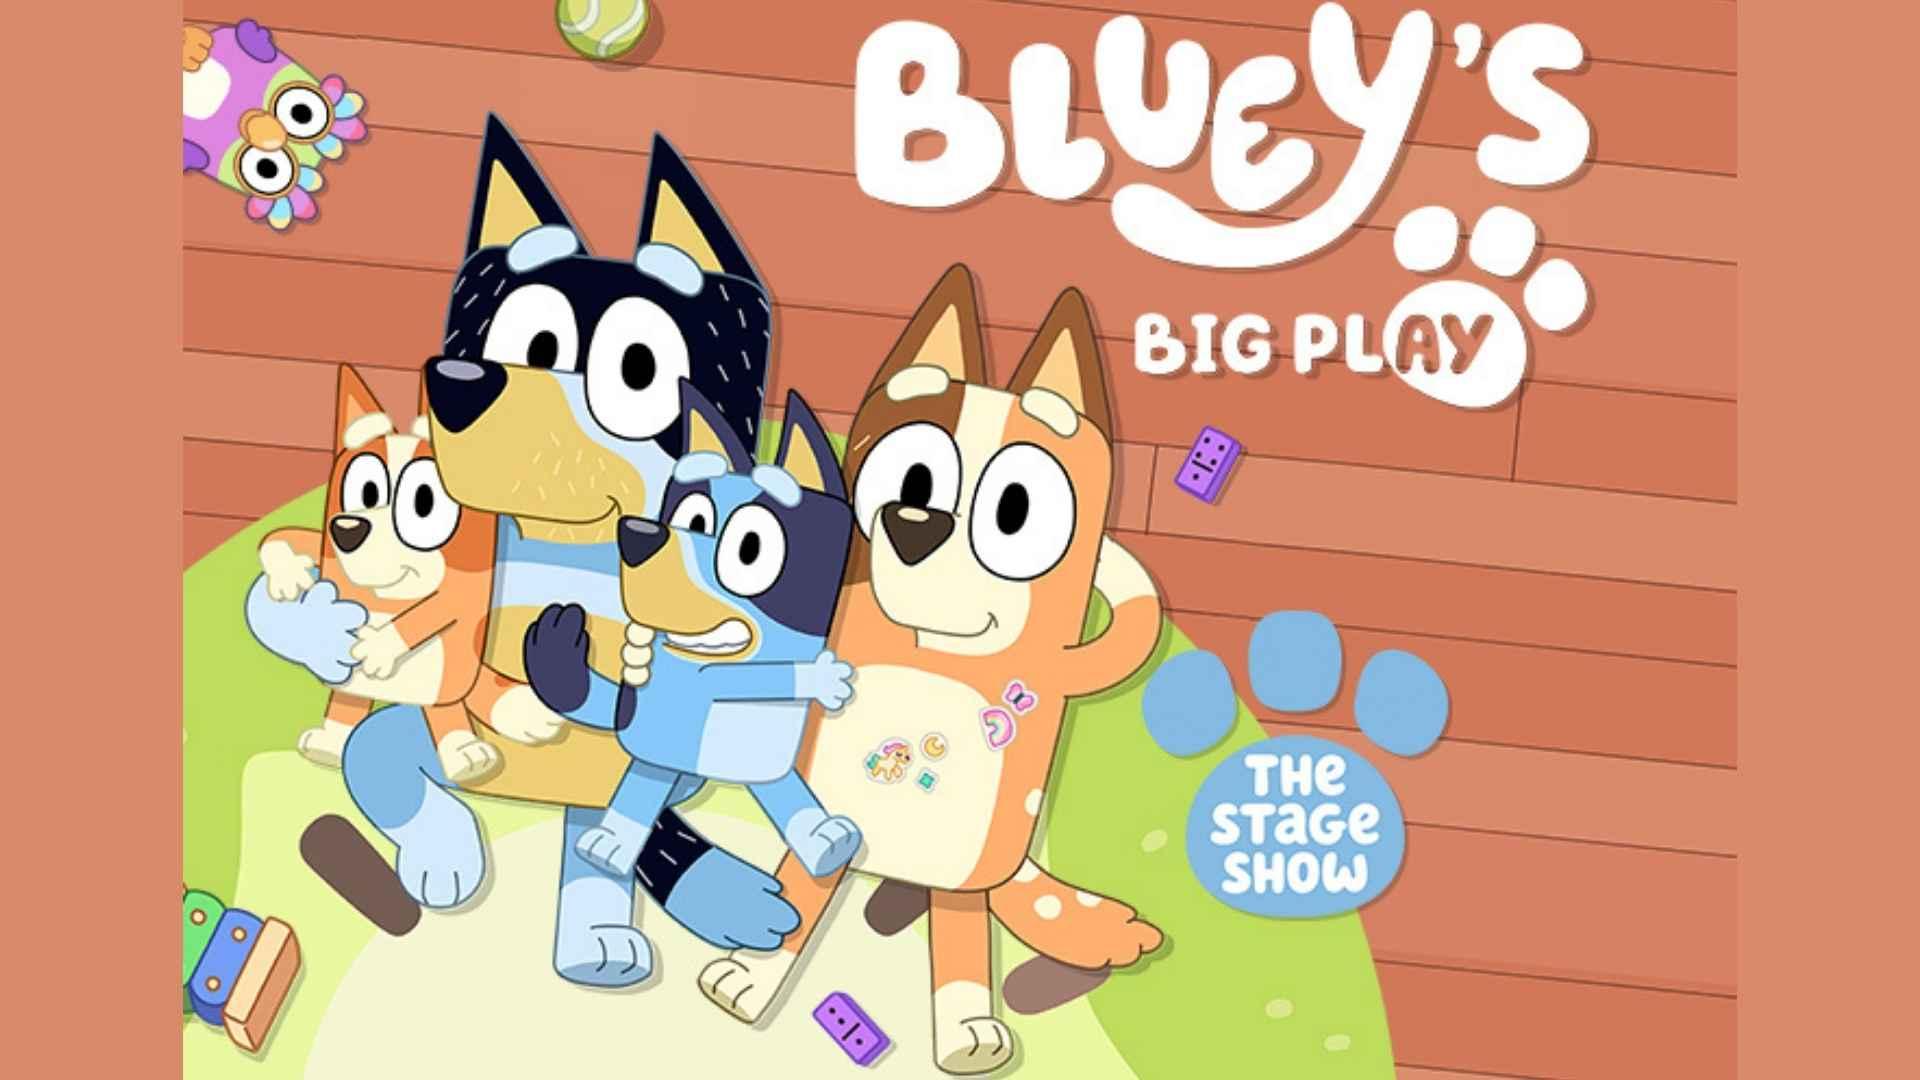 Bluey's-big-play